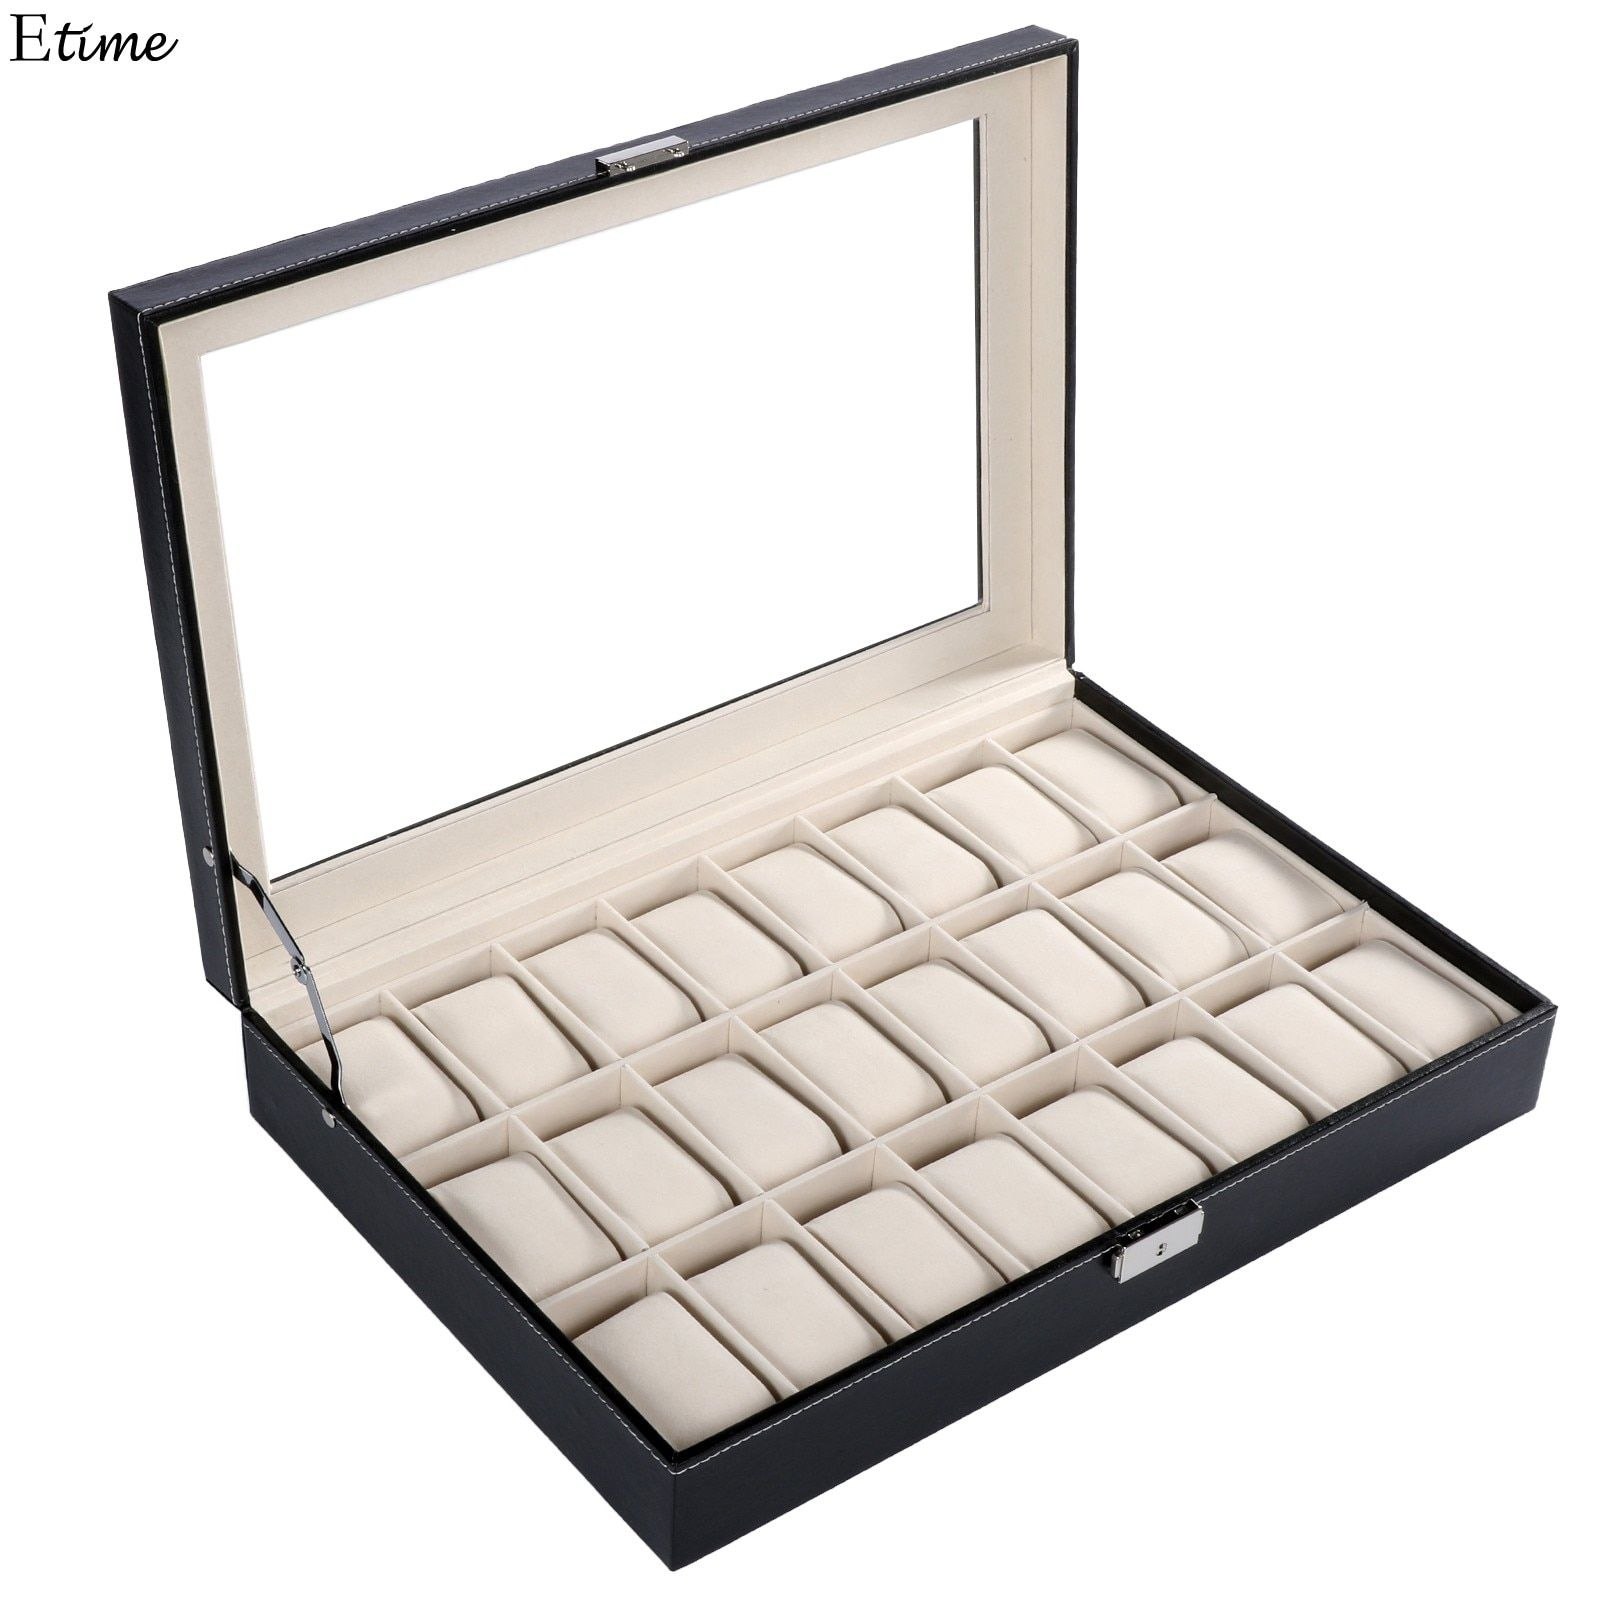 FANALA 2017 PU Leather Watch Display Box 24 <font><b>Grid</b></font> Watch Case Jewelry Storage Organizer